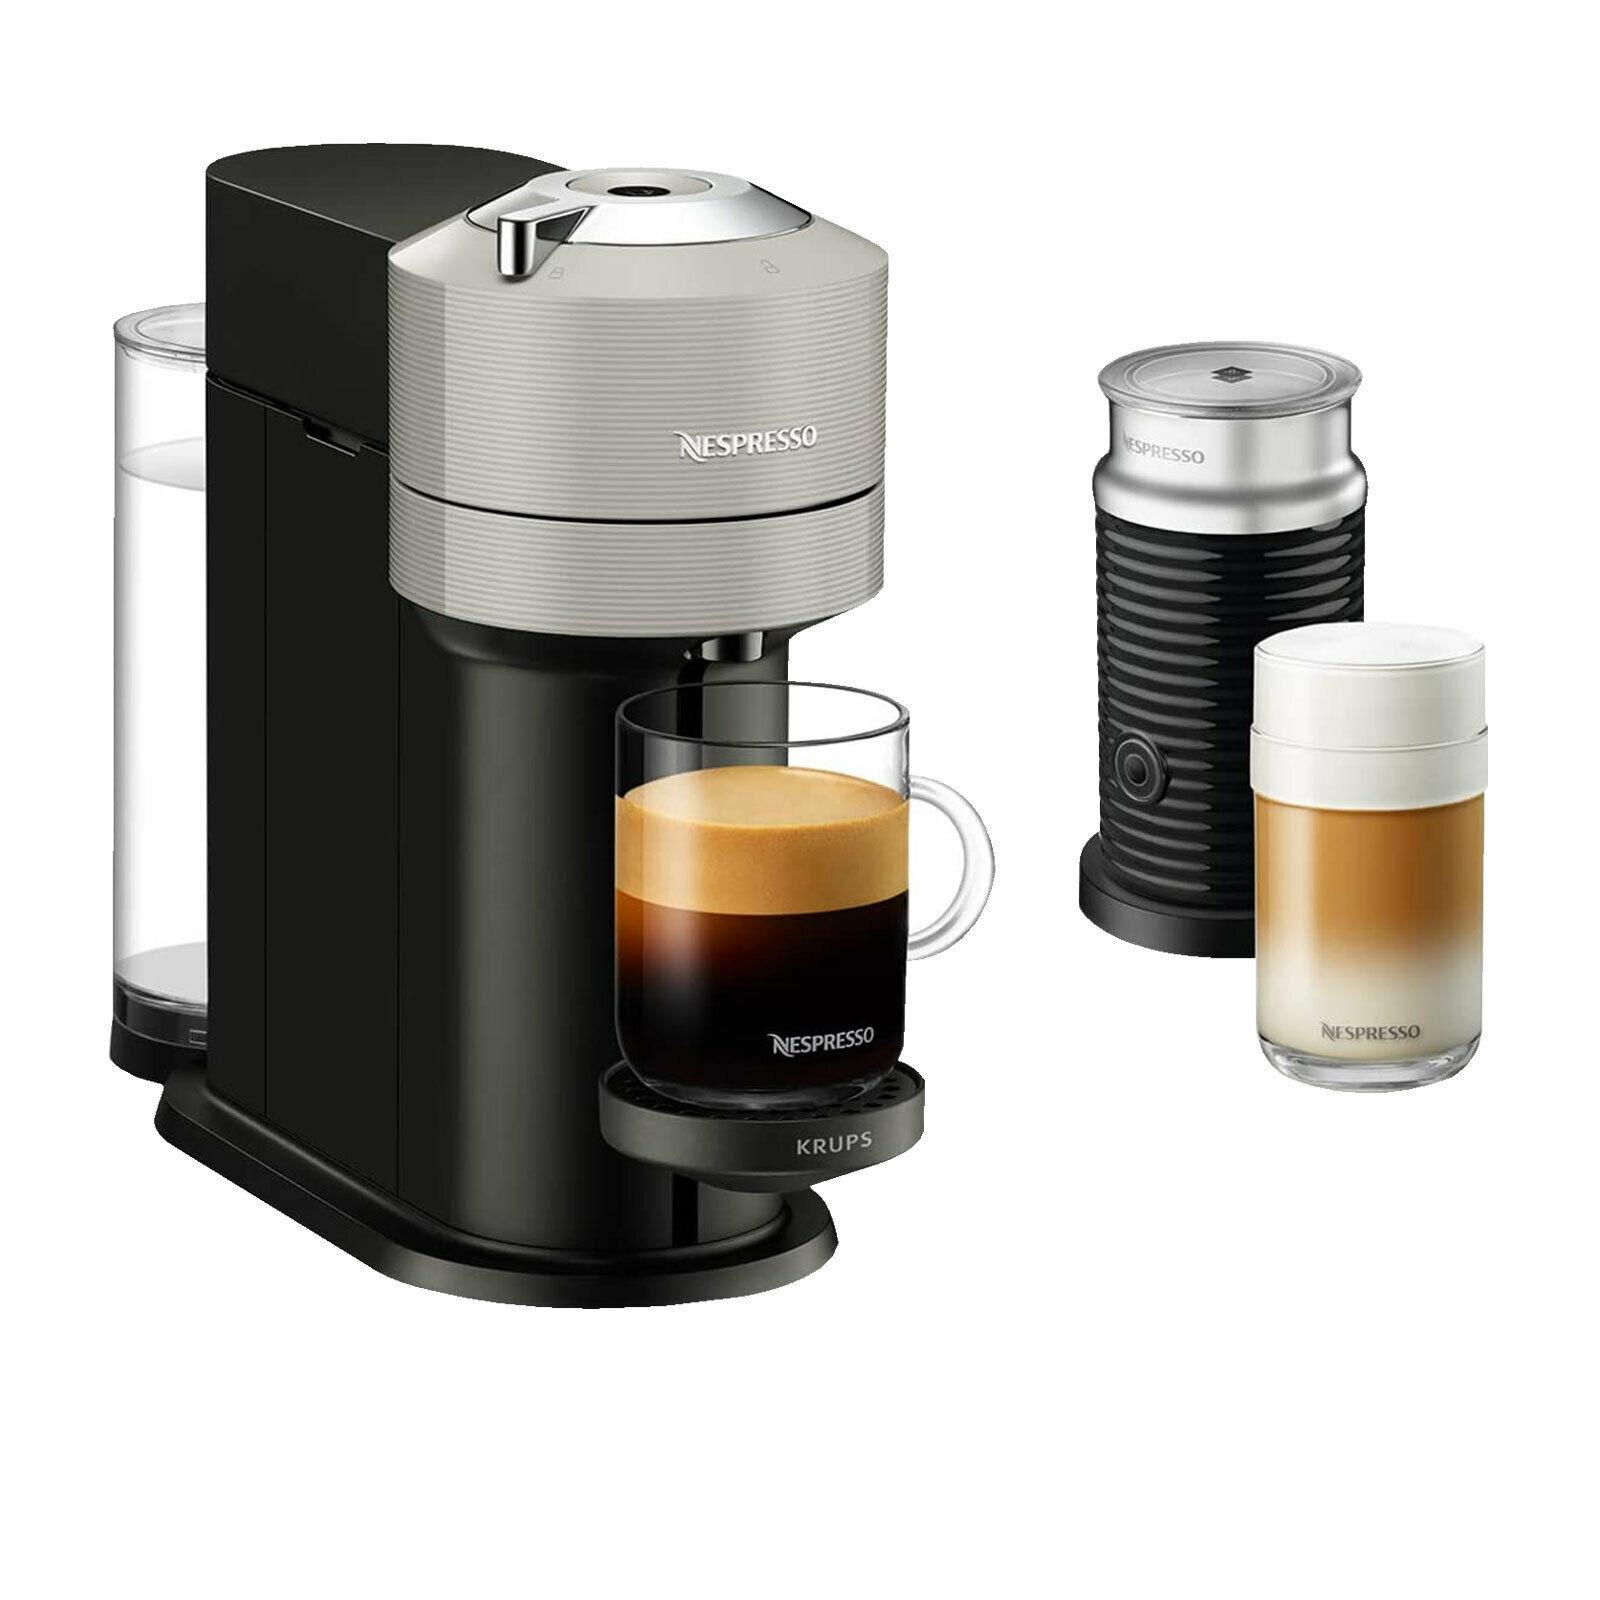 [ebay WOW] Krups XN910B Nespresso Vertuo Kaffeemaschine mit Aeroccino 3